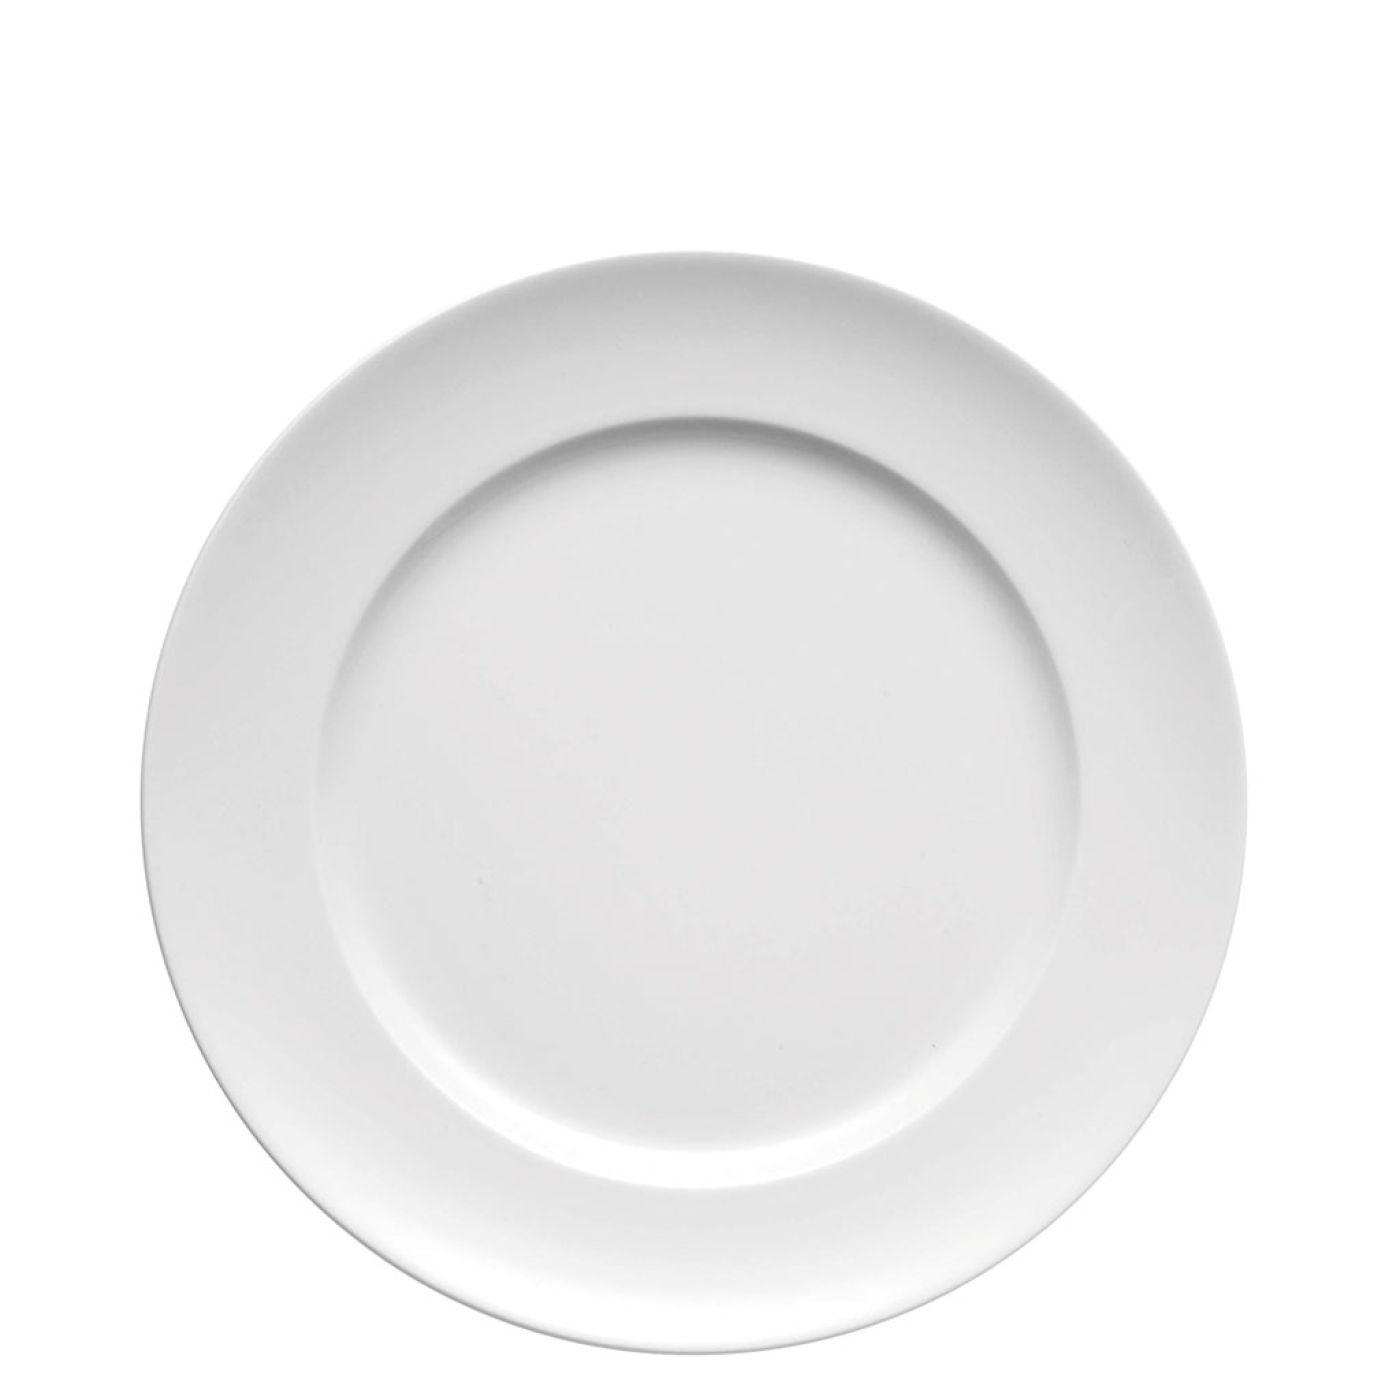 Онлайн каталог PROMENU: Тарелка основная Rosenthal SUNNY DAY, диаметр 27 см, белый Rosenthal 70850-800001-10227